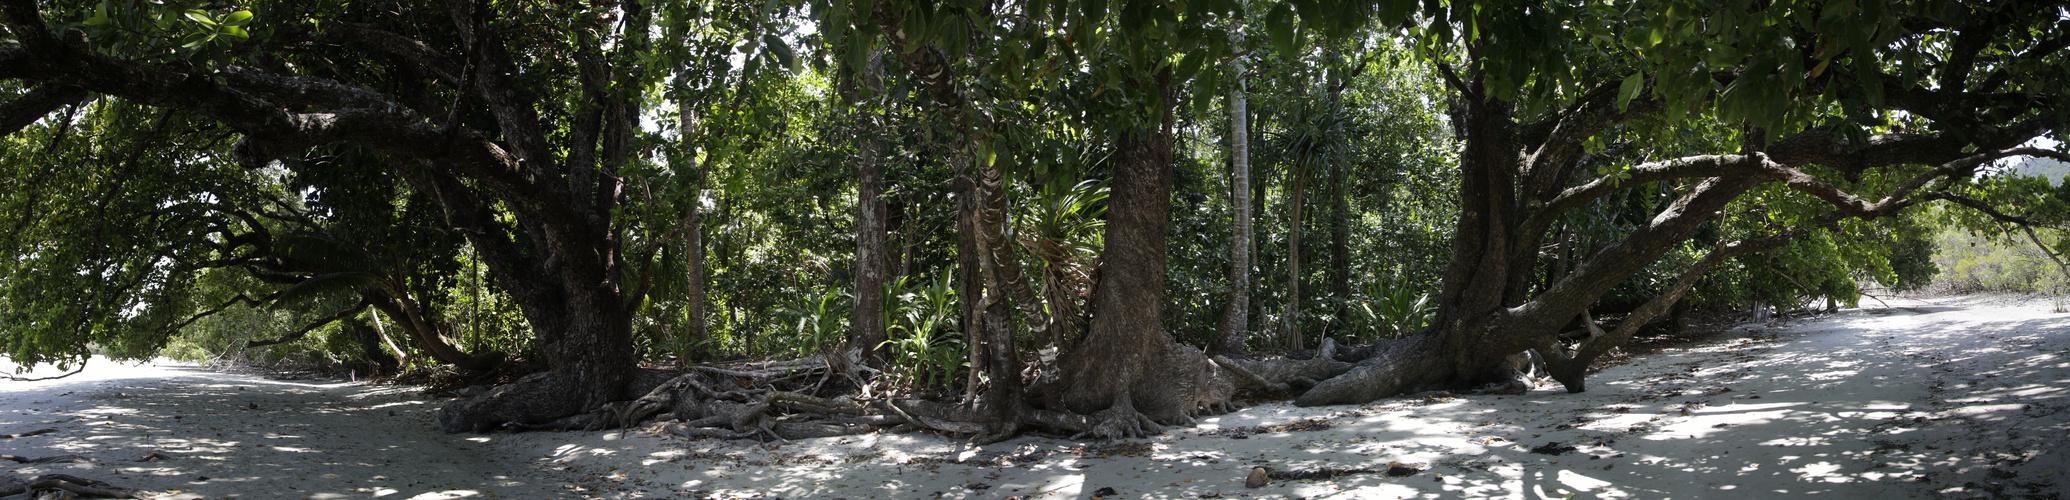 strandbäume